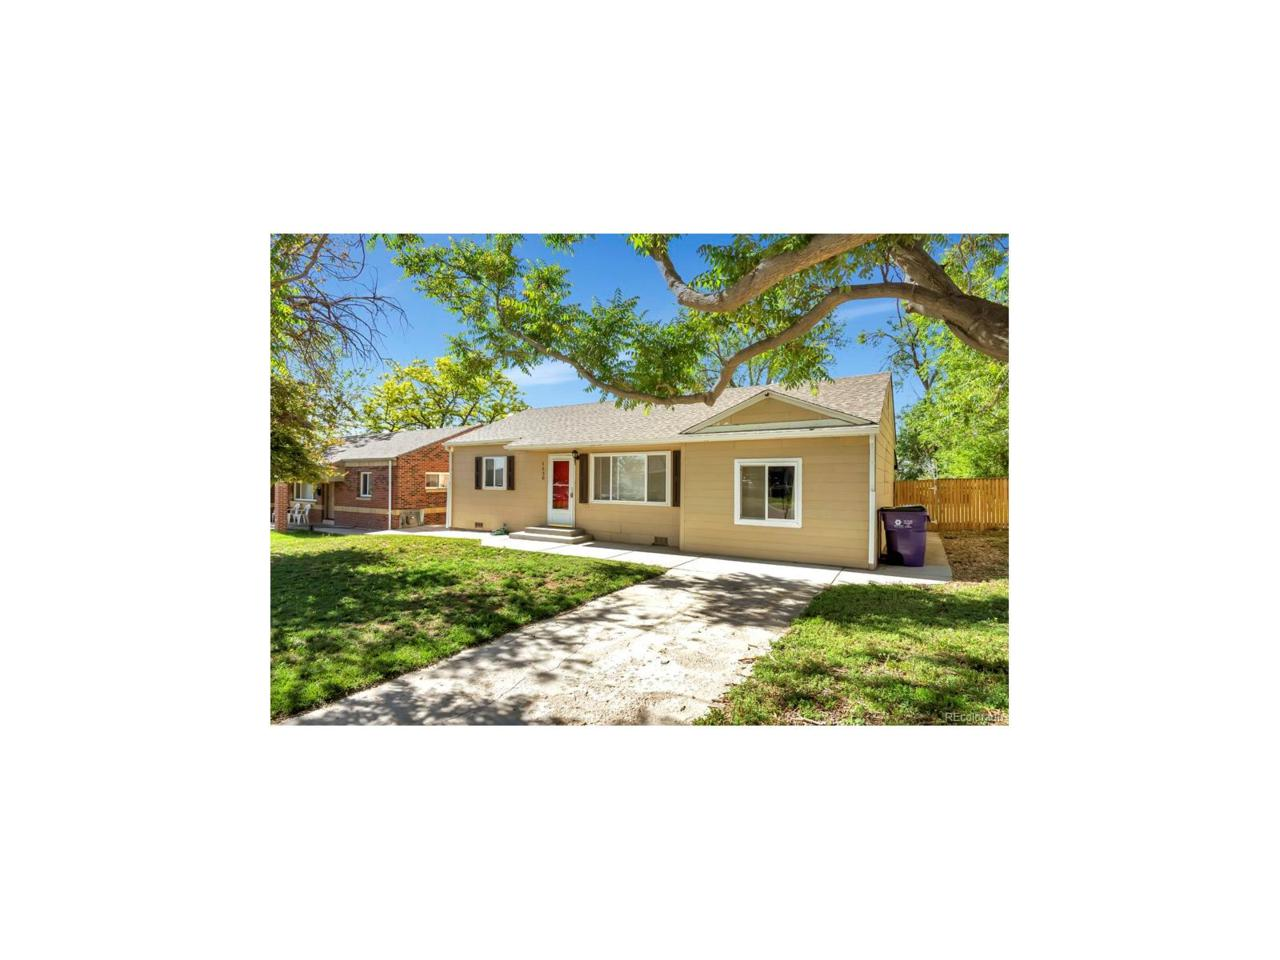 1530 W Berkeley Place, Denver, CO 80221 (MLS #3502144) :: 8z Real Estate